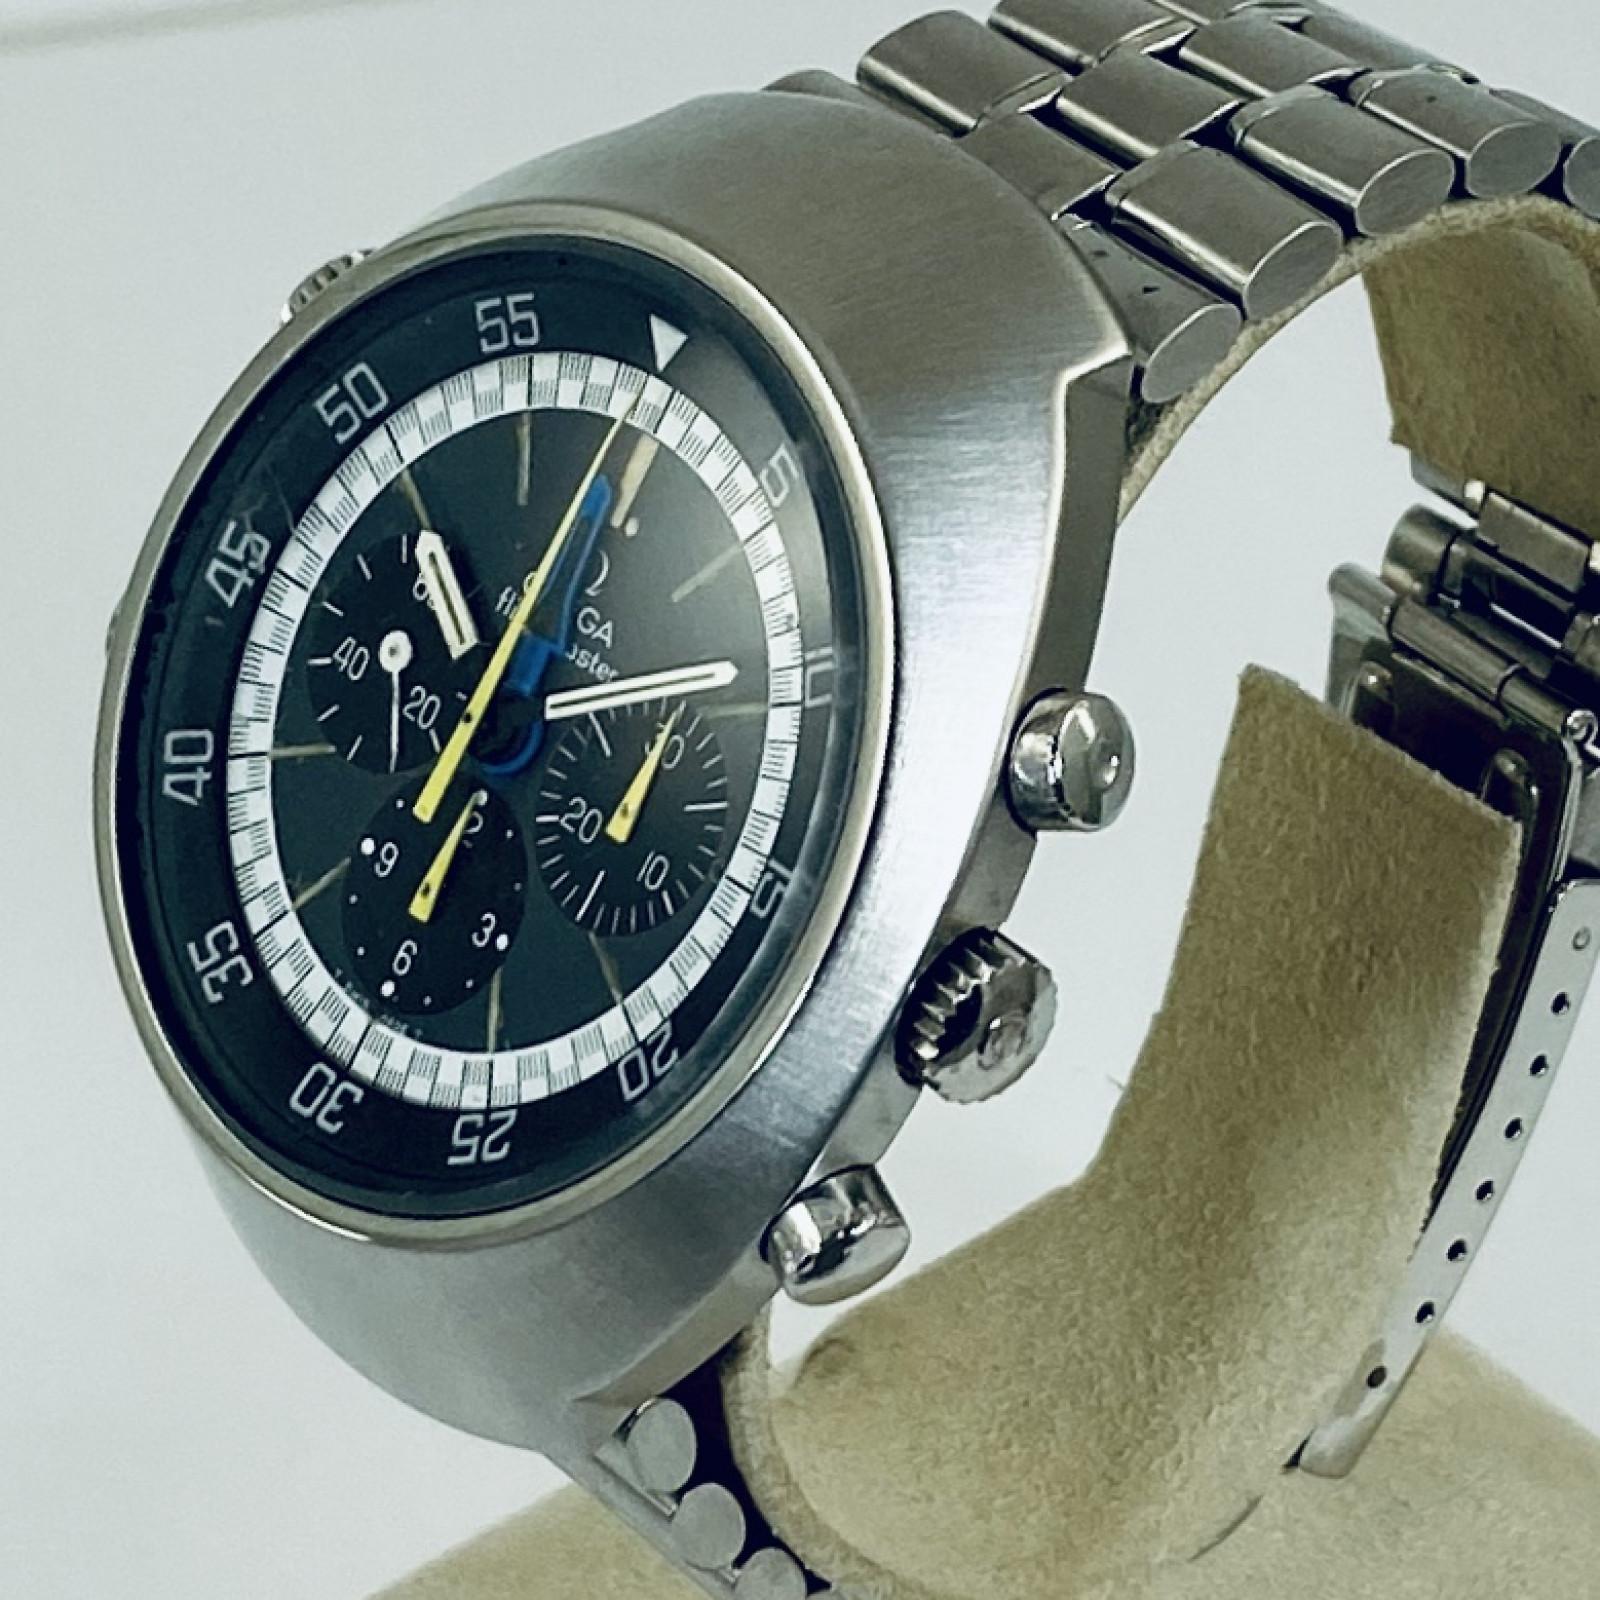 1967 Chronograph Omega Flightmaster 145.013